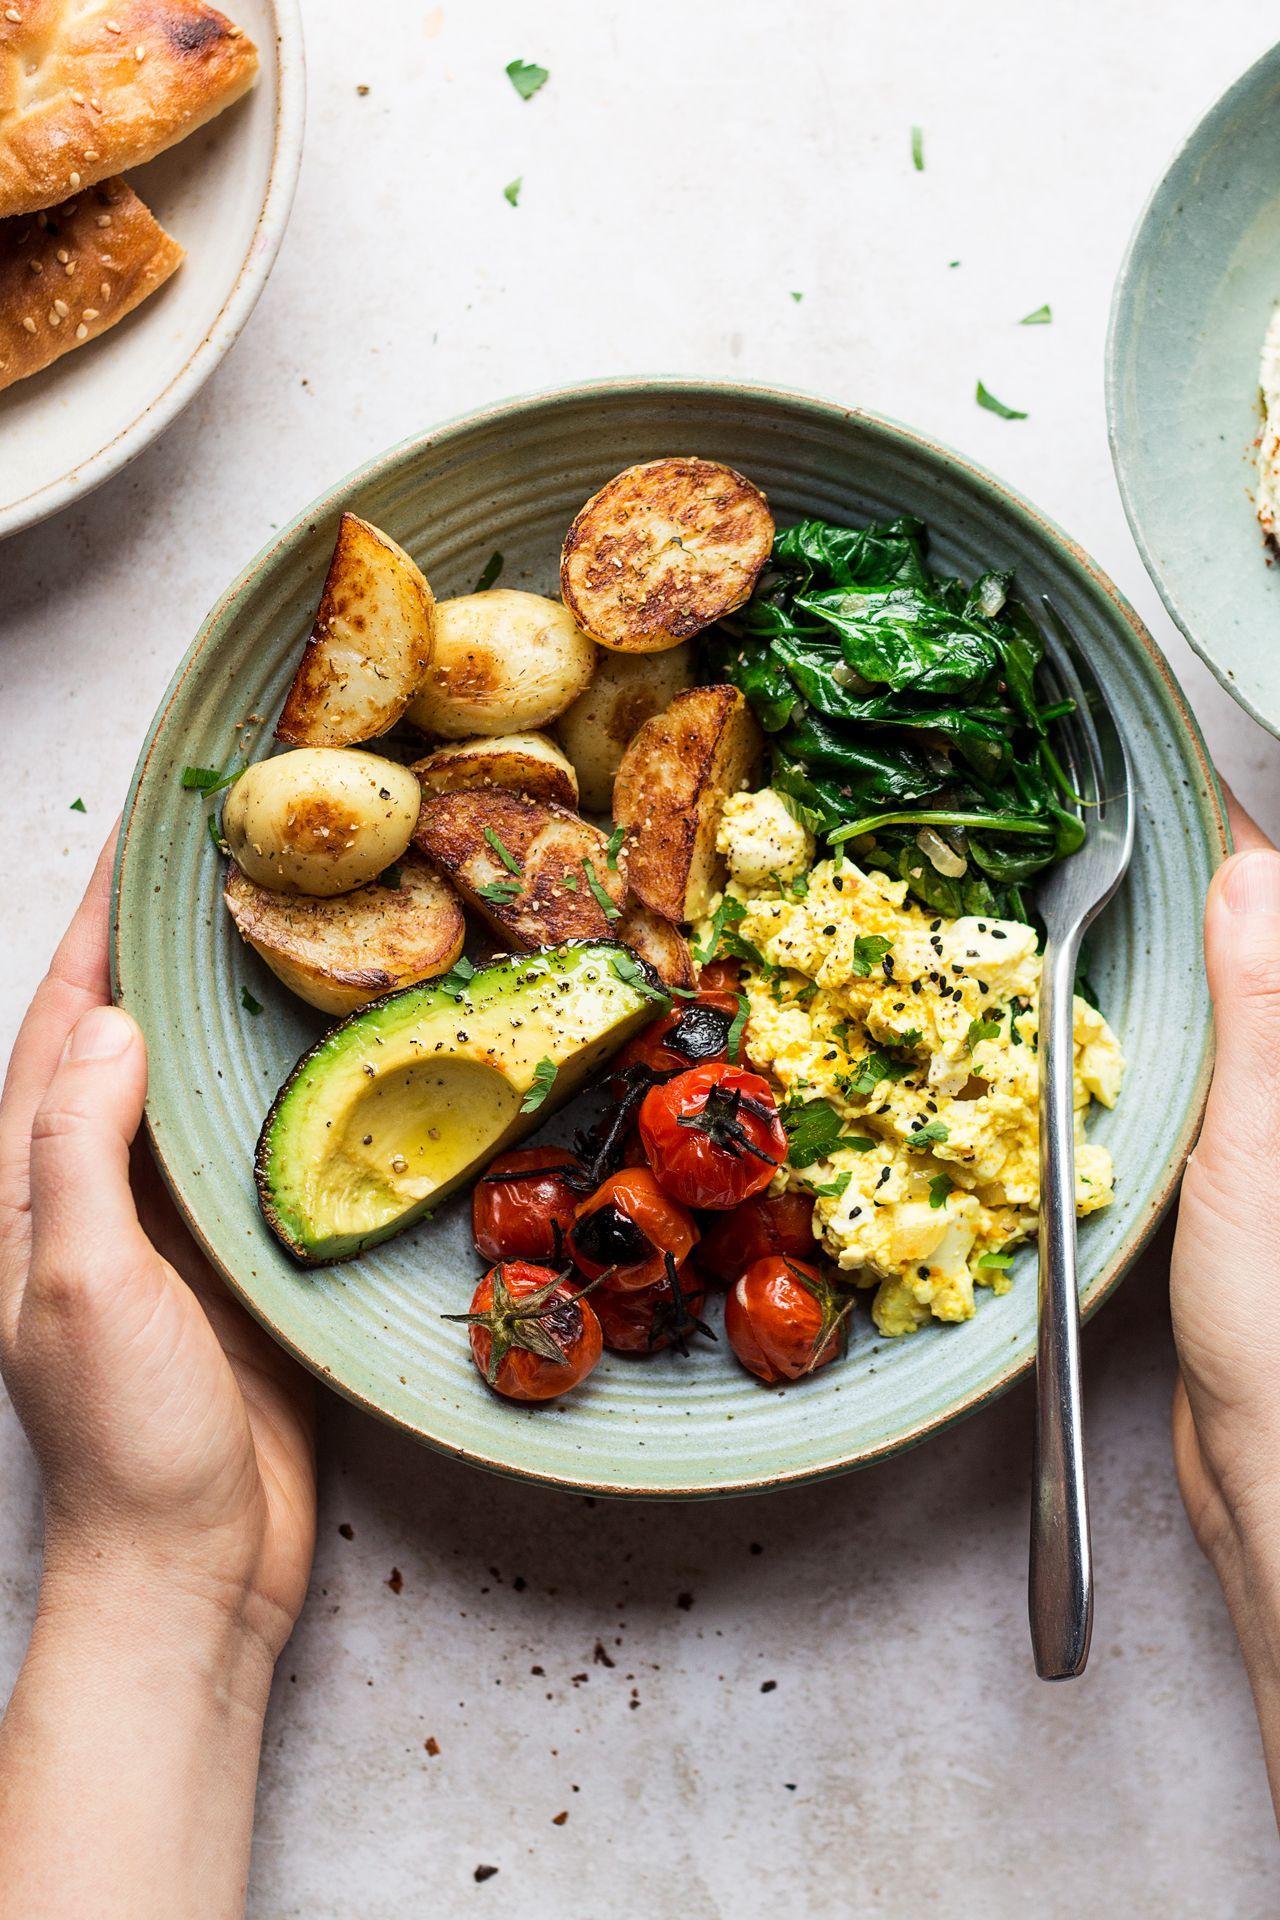 Savoury Vegan Breakfast Bowl Lazy Cat Kitchen Veganbreakfast In 2020 Breakfast Bowl Vegan Healthy Breakfast Recipes Savory Vegan